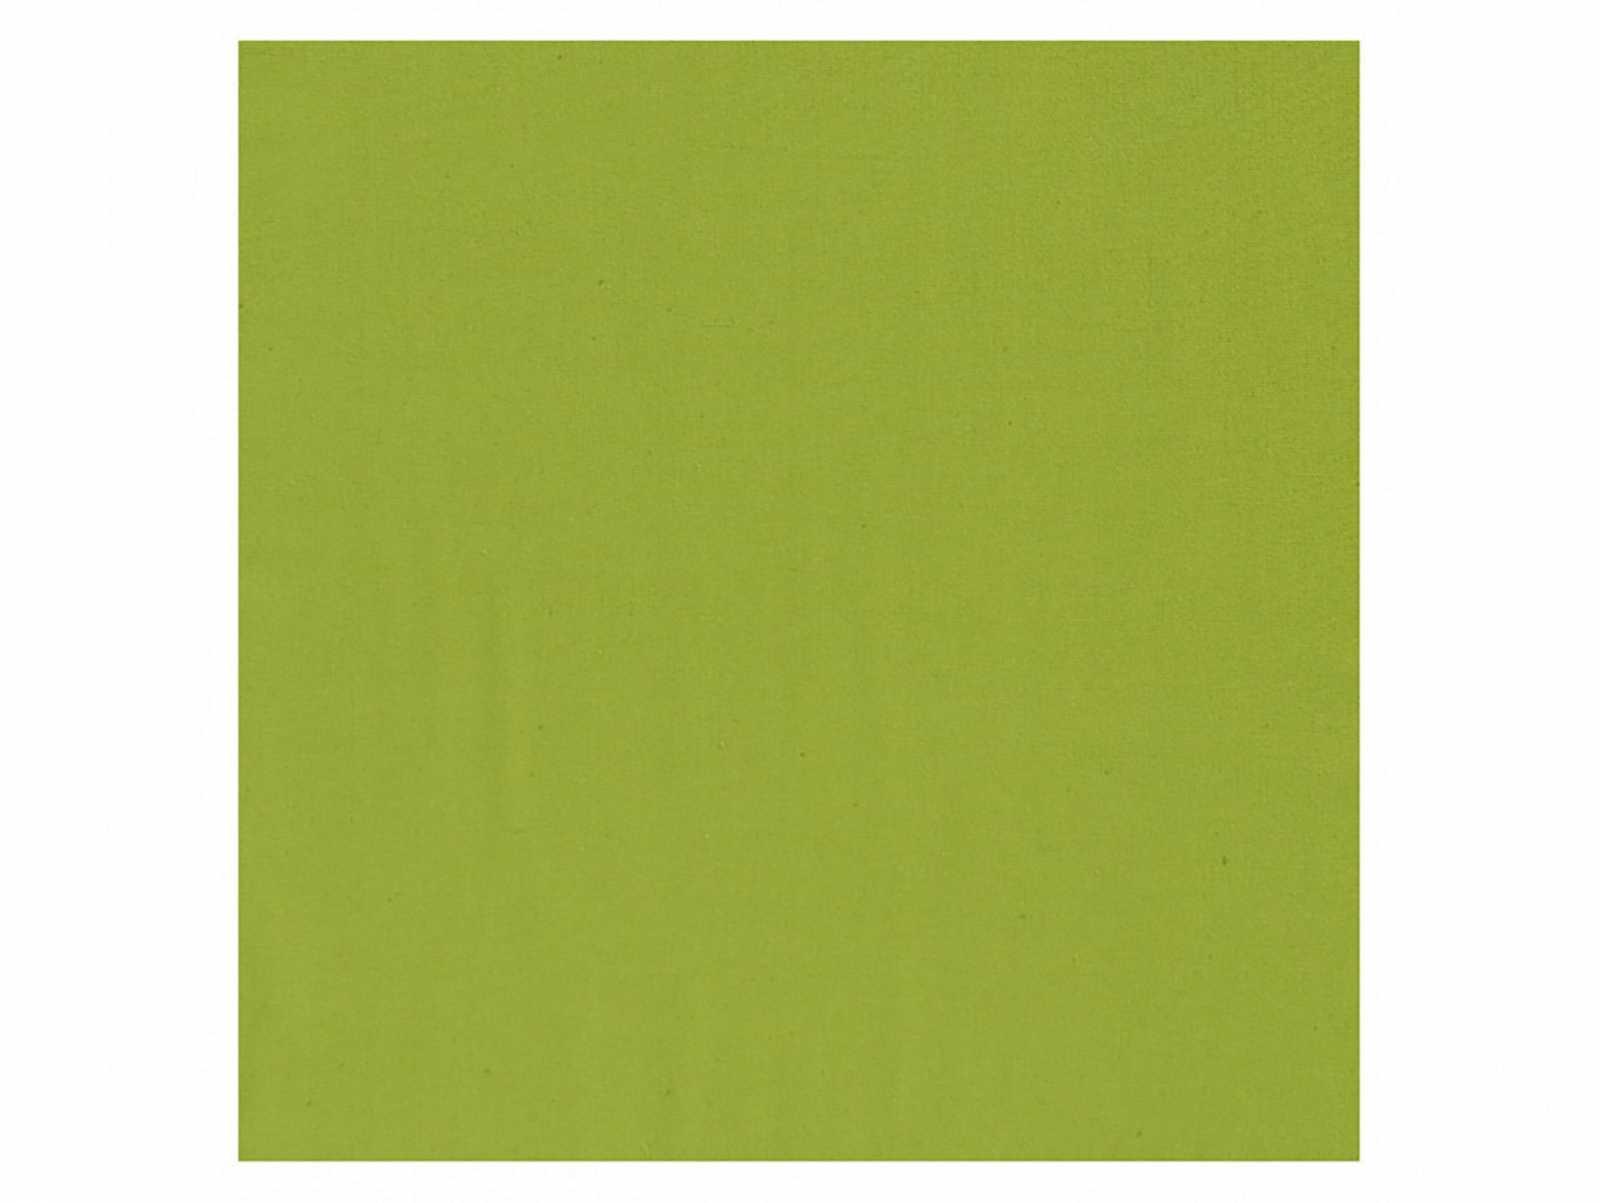 Онлайн каталог PROMENU: Салфетка хлопковая Winkler FANTASY ACID, 50х50 см, зеленый Winkler 6547022000